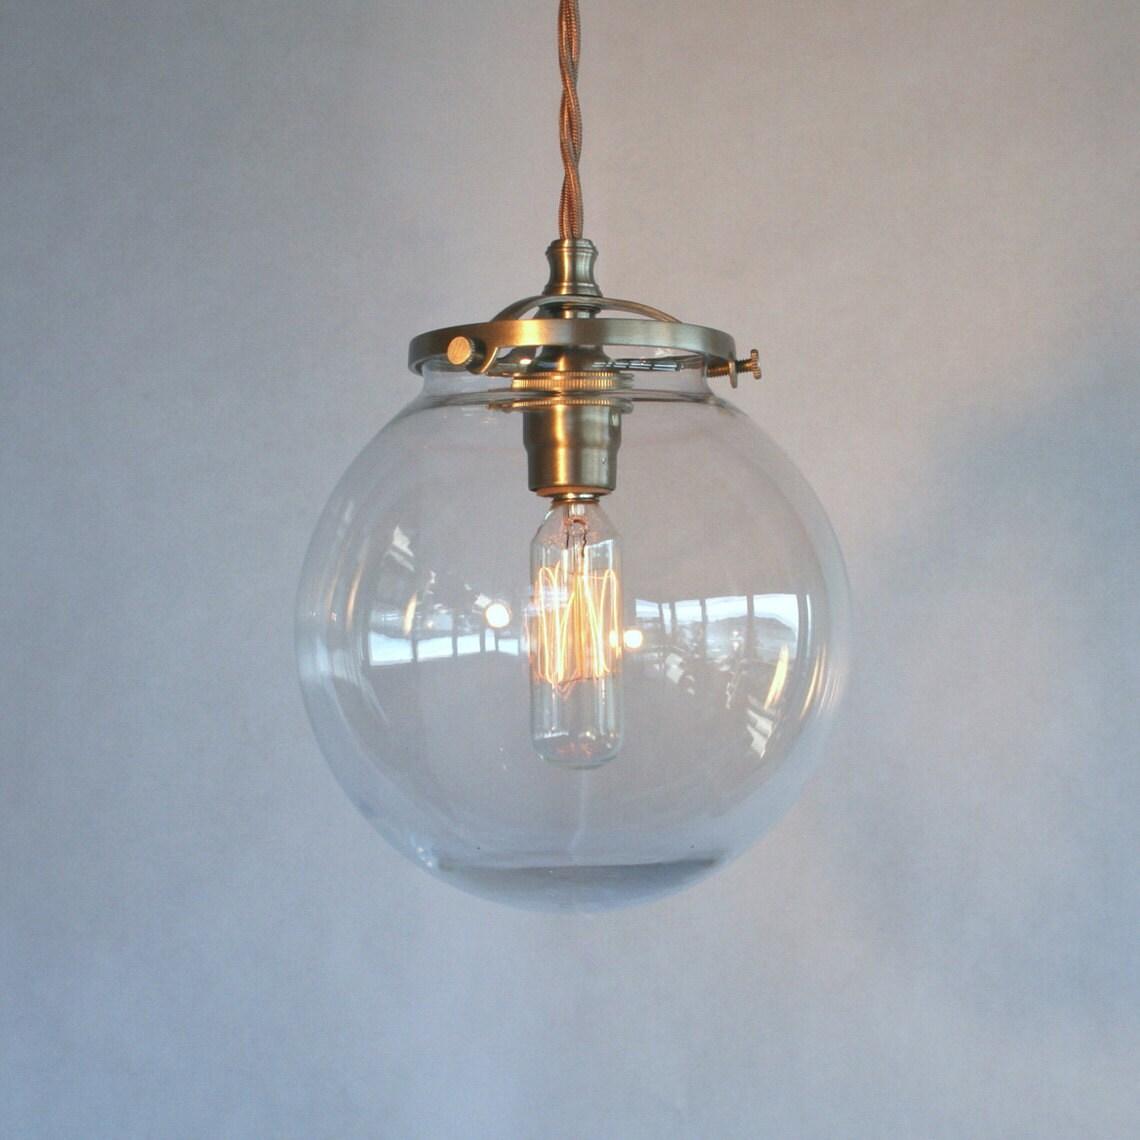 Modern Globe Pendant Lighting : Clear globe pendant light modern by sanctumlighting